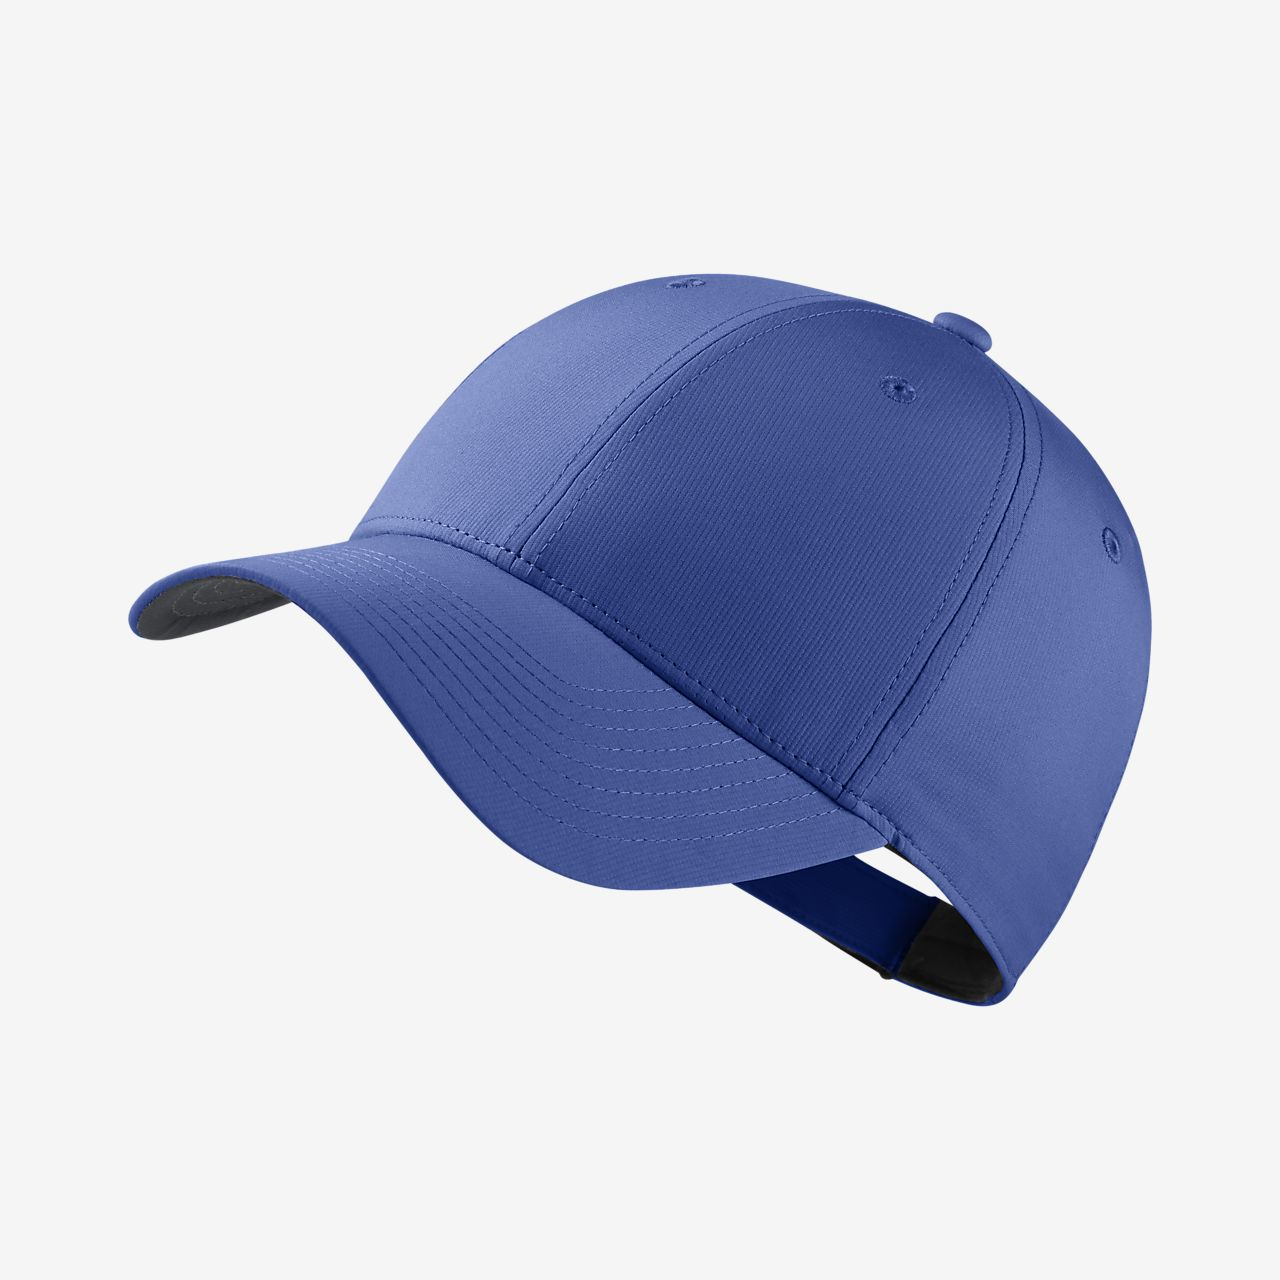 6ea6b6120e0cf Nike Dri-FIT Legacy91 Golf Hat. Nike.com CA